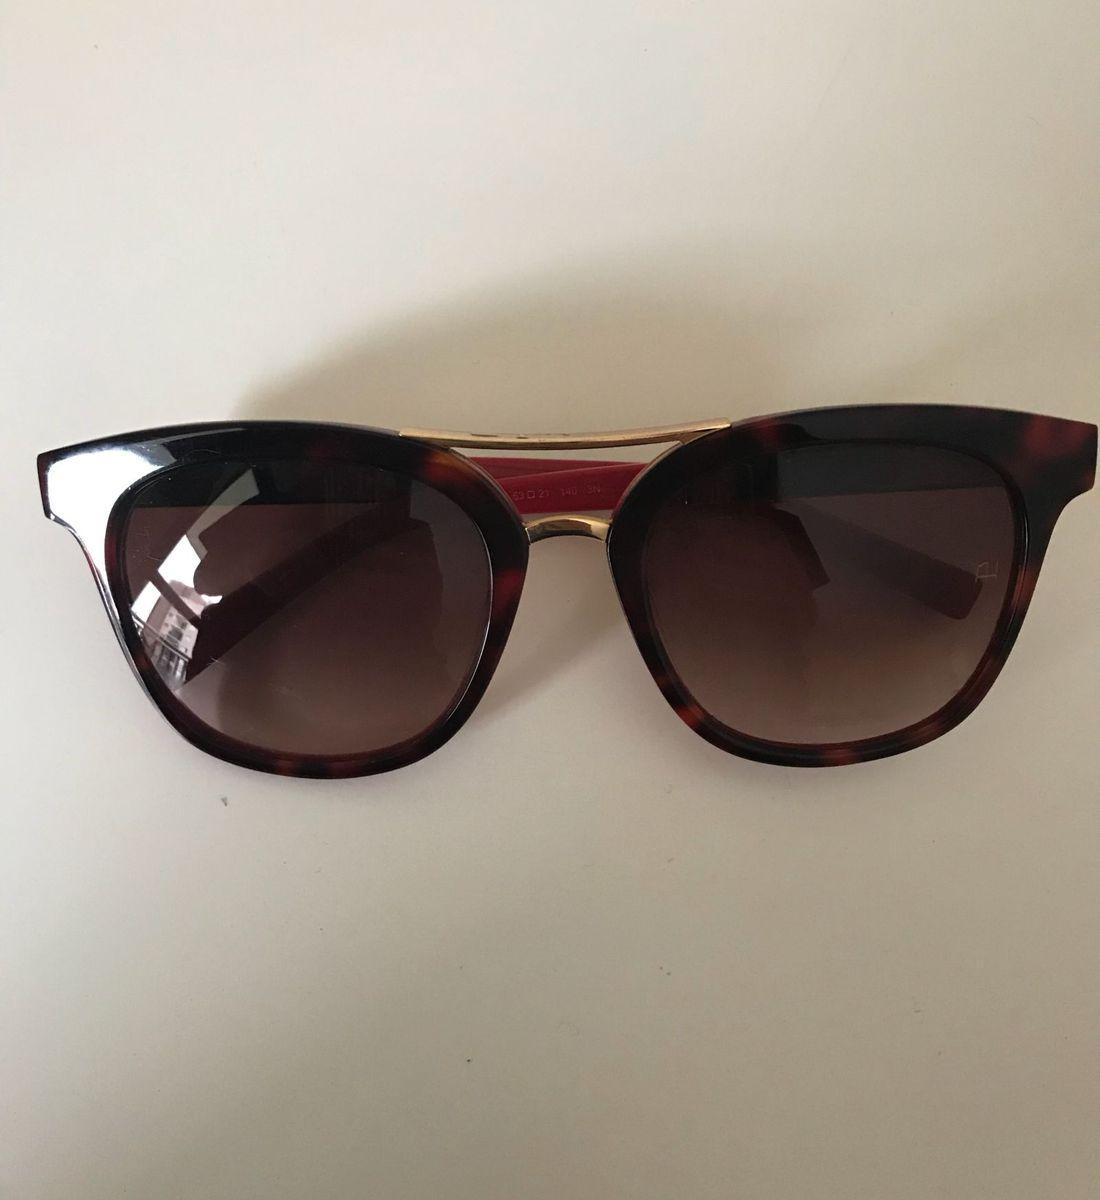 óculos de sol vermelho - óculos ana hickmann.  Czm6ly9wag90b3muzw5qb2vplmnvbs5ici9wcm9kdwn0cy8xmdg2odgvnzizowy1mzy2mtg1odu1ntrintmwzmi3mzdmmdyzmtkuanbn  ... f7cb37eb03